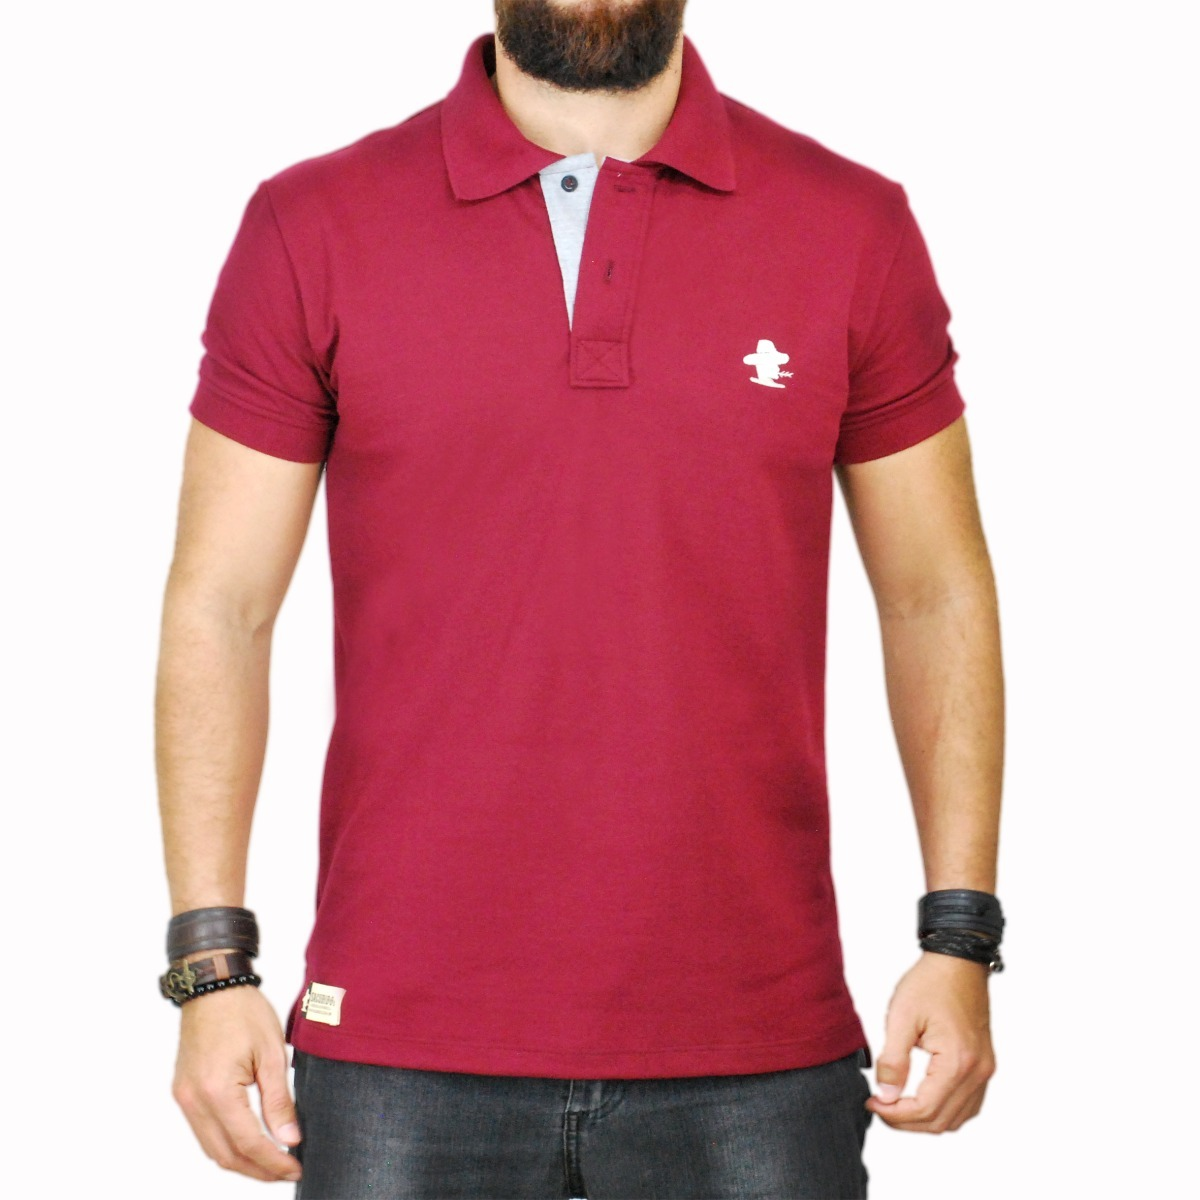 Camiseta Polo Sacudido s - Vinho E Cinza - R  109 be9561359297a